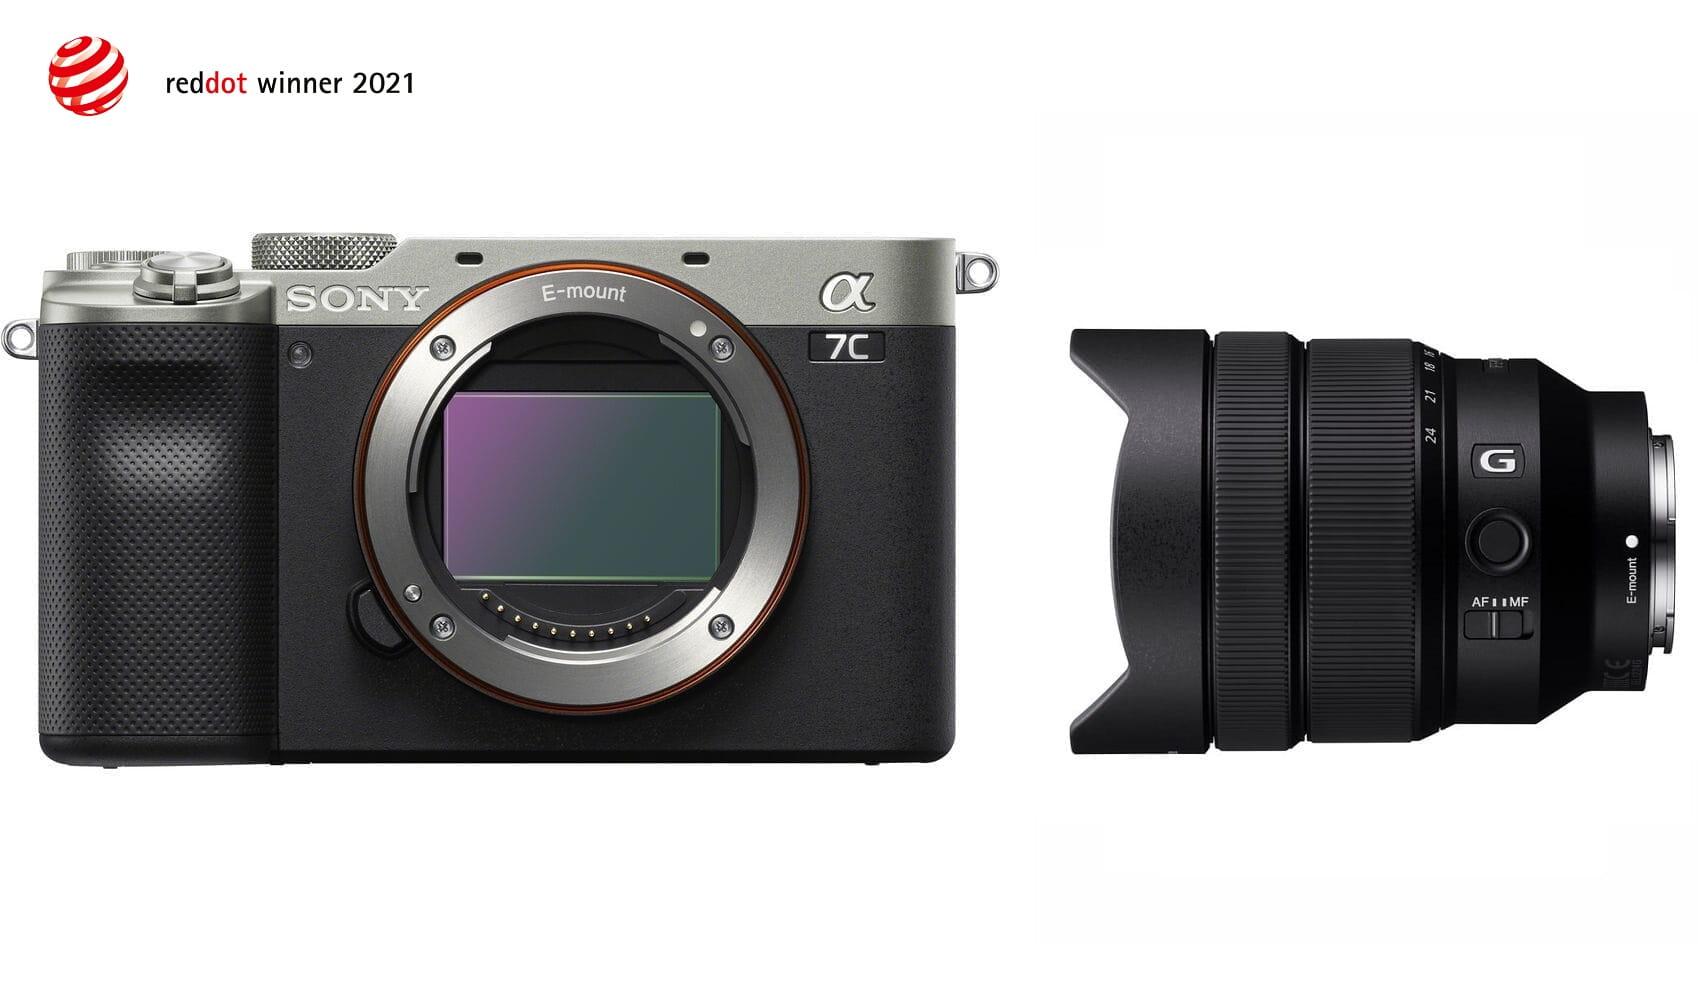 Aparat cyfrowy Sony A7C srebrny ILCE7C + obiektyw FE 12-24 mm f/4.0 G - SEL1224G + cashback 650 i 450 zł